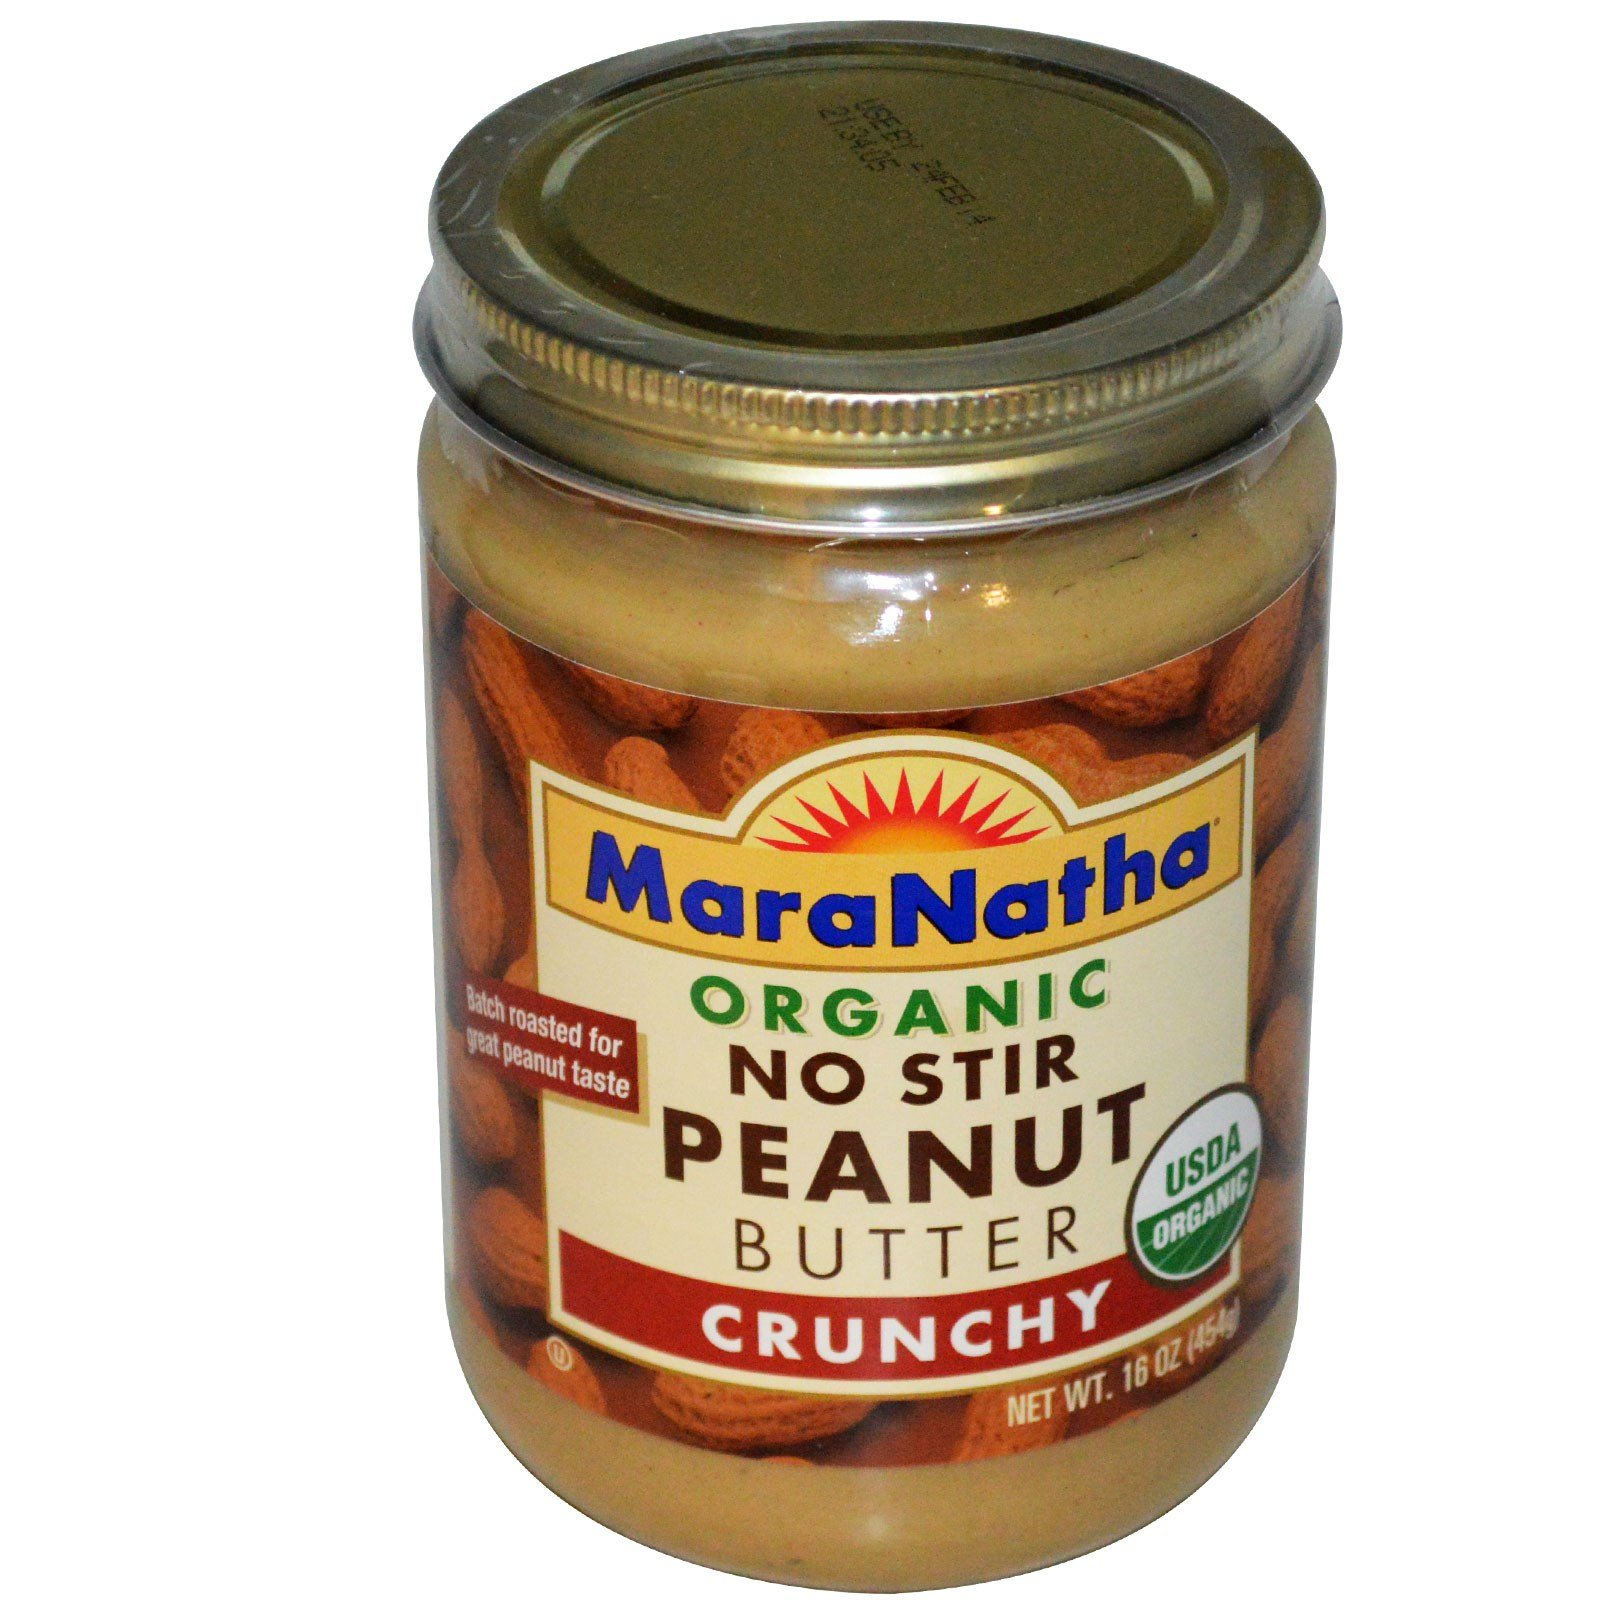 MaraNatha, Organic No Stir Peanut Butter, Crunchy, 16 oz (454 g) -- 2PC